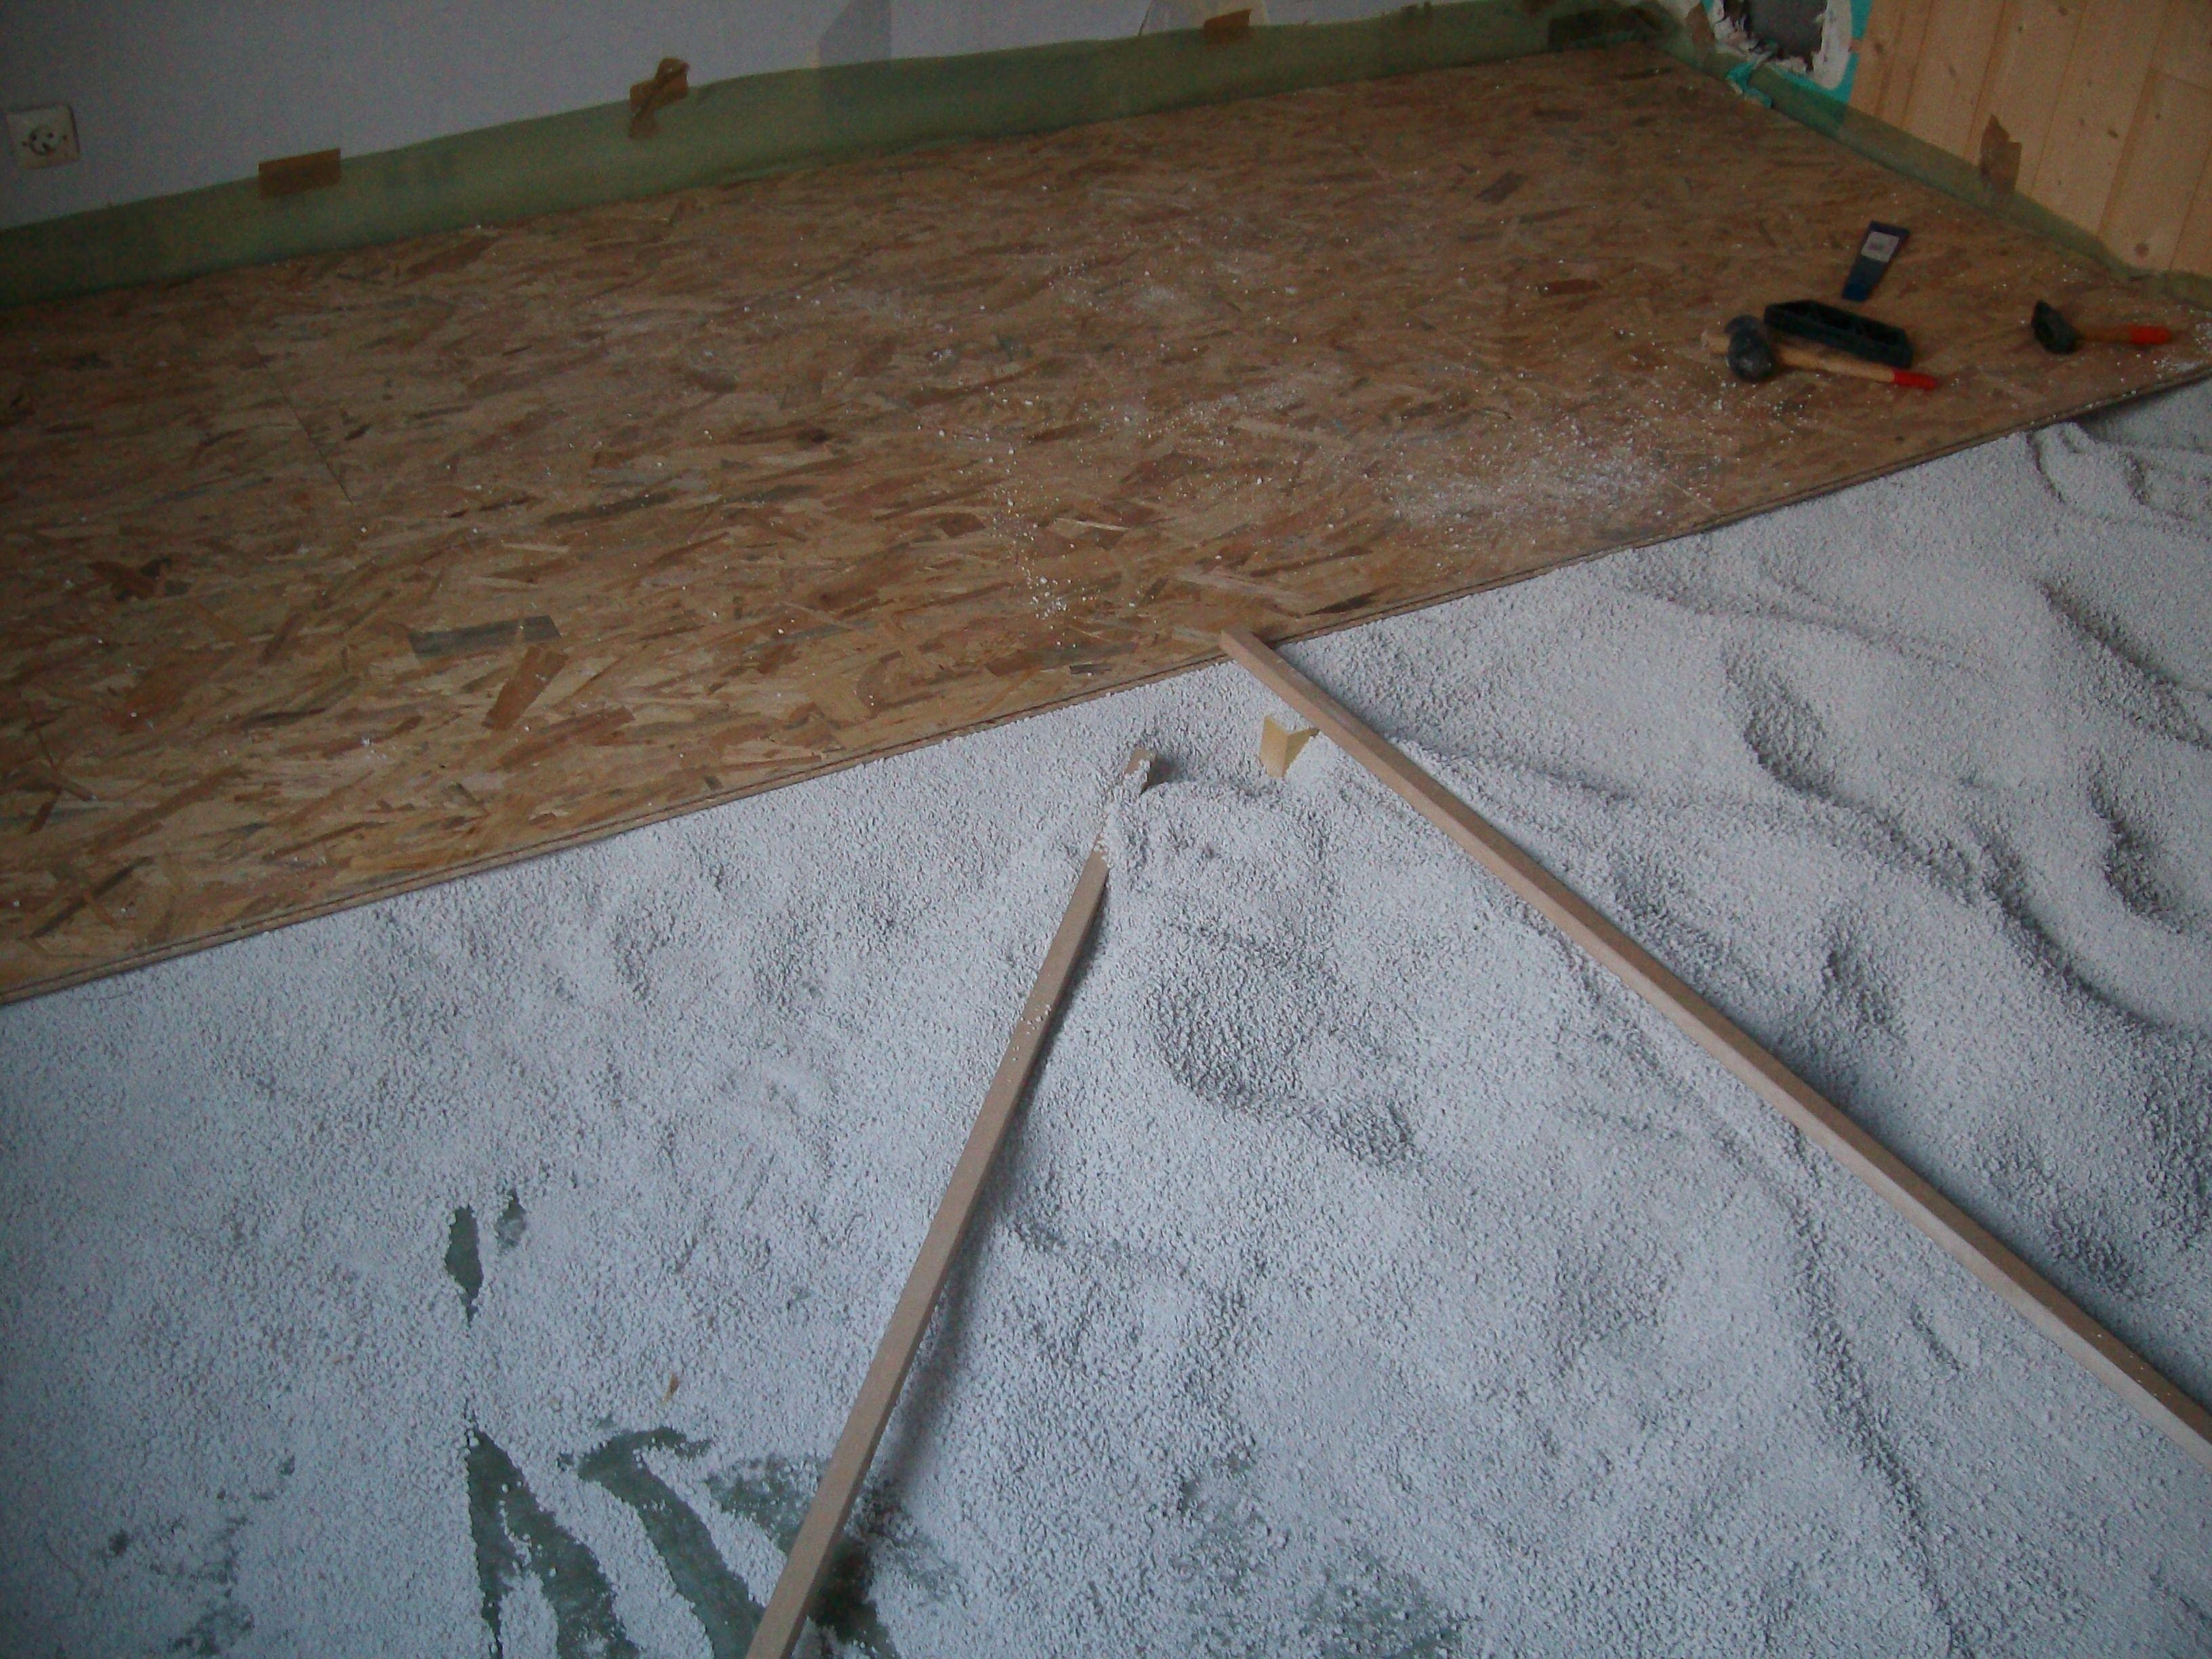 plancher leroy merlin abris de jardin avec plancher leroy merlin with plancher leroy merlin. Black Bedroom Furniture Sets. Home Design Ideas